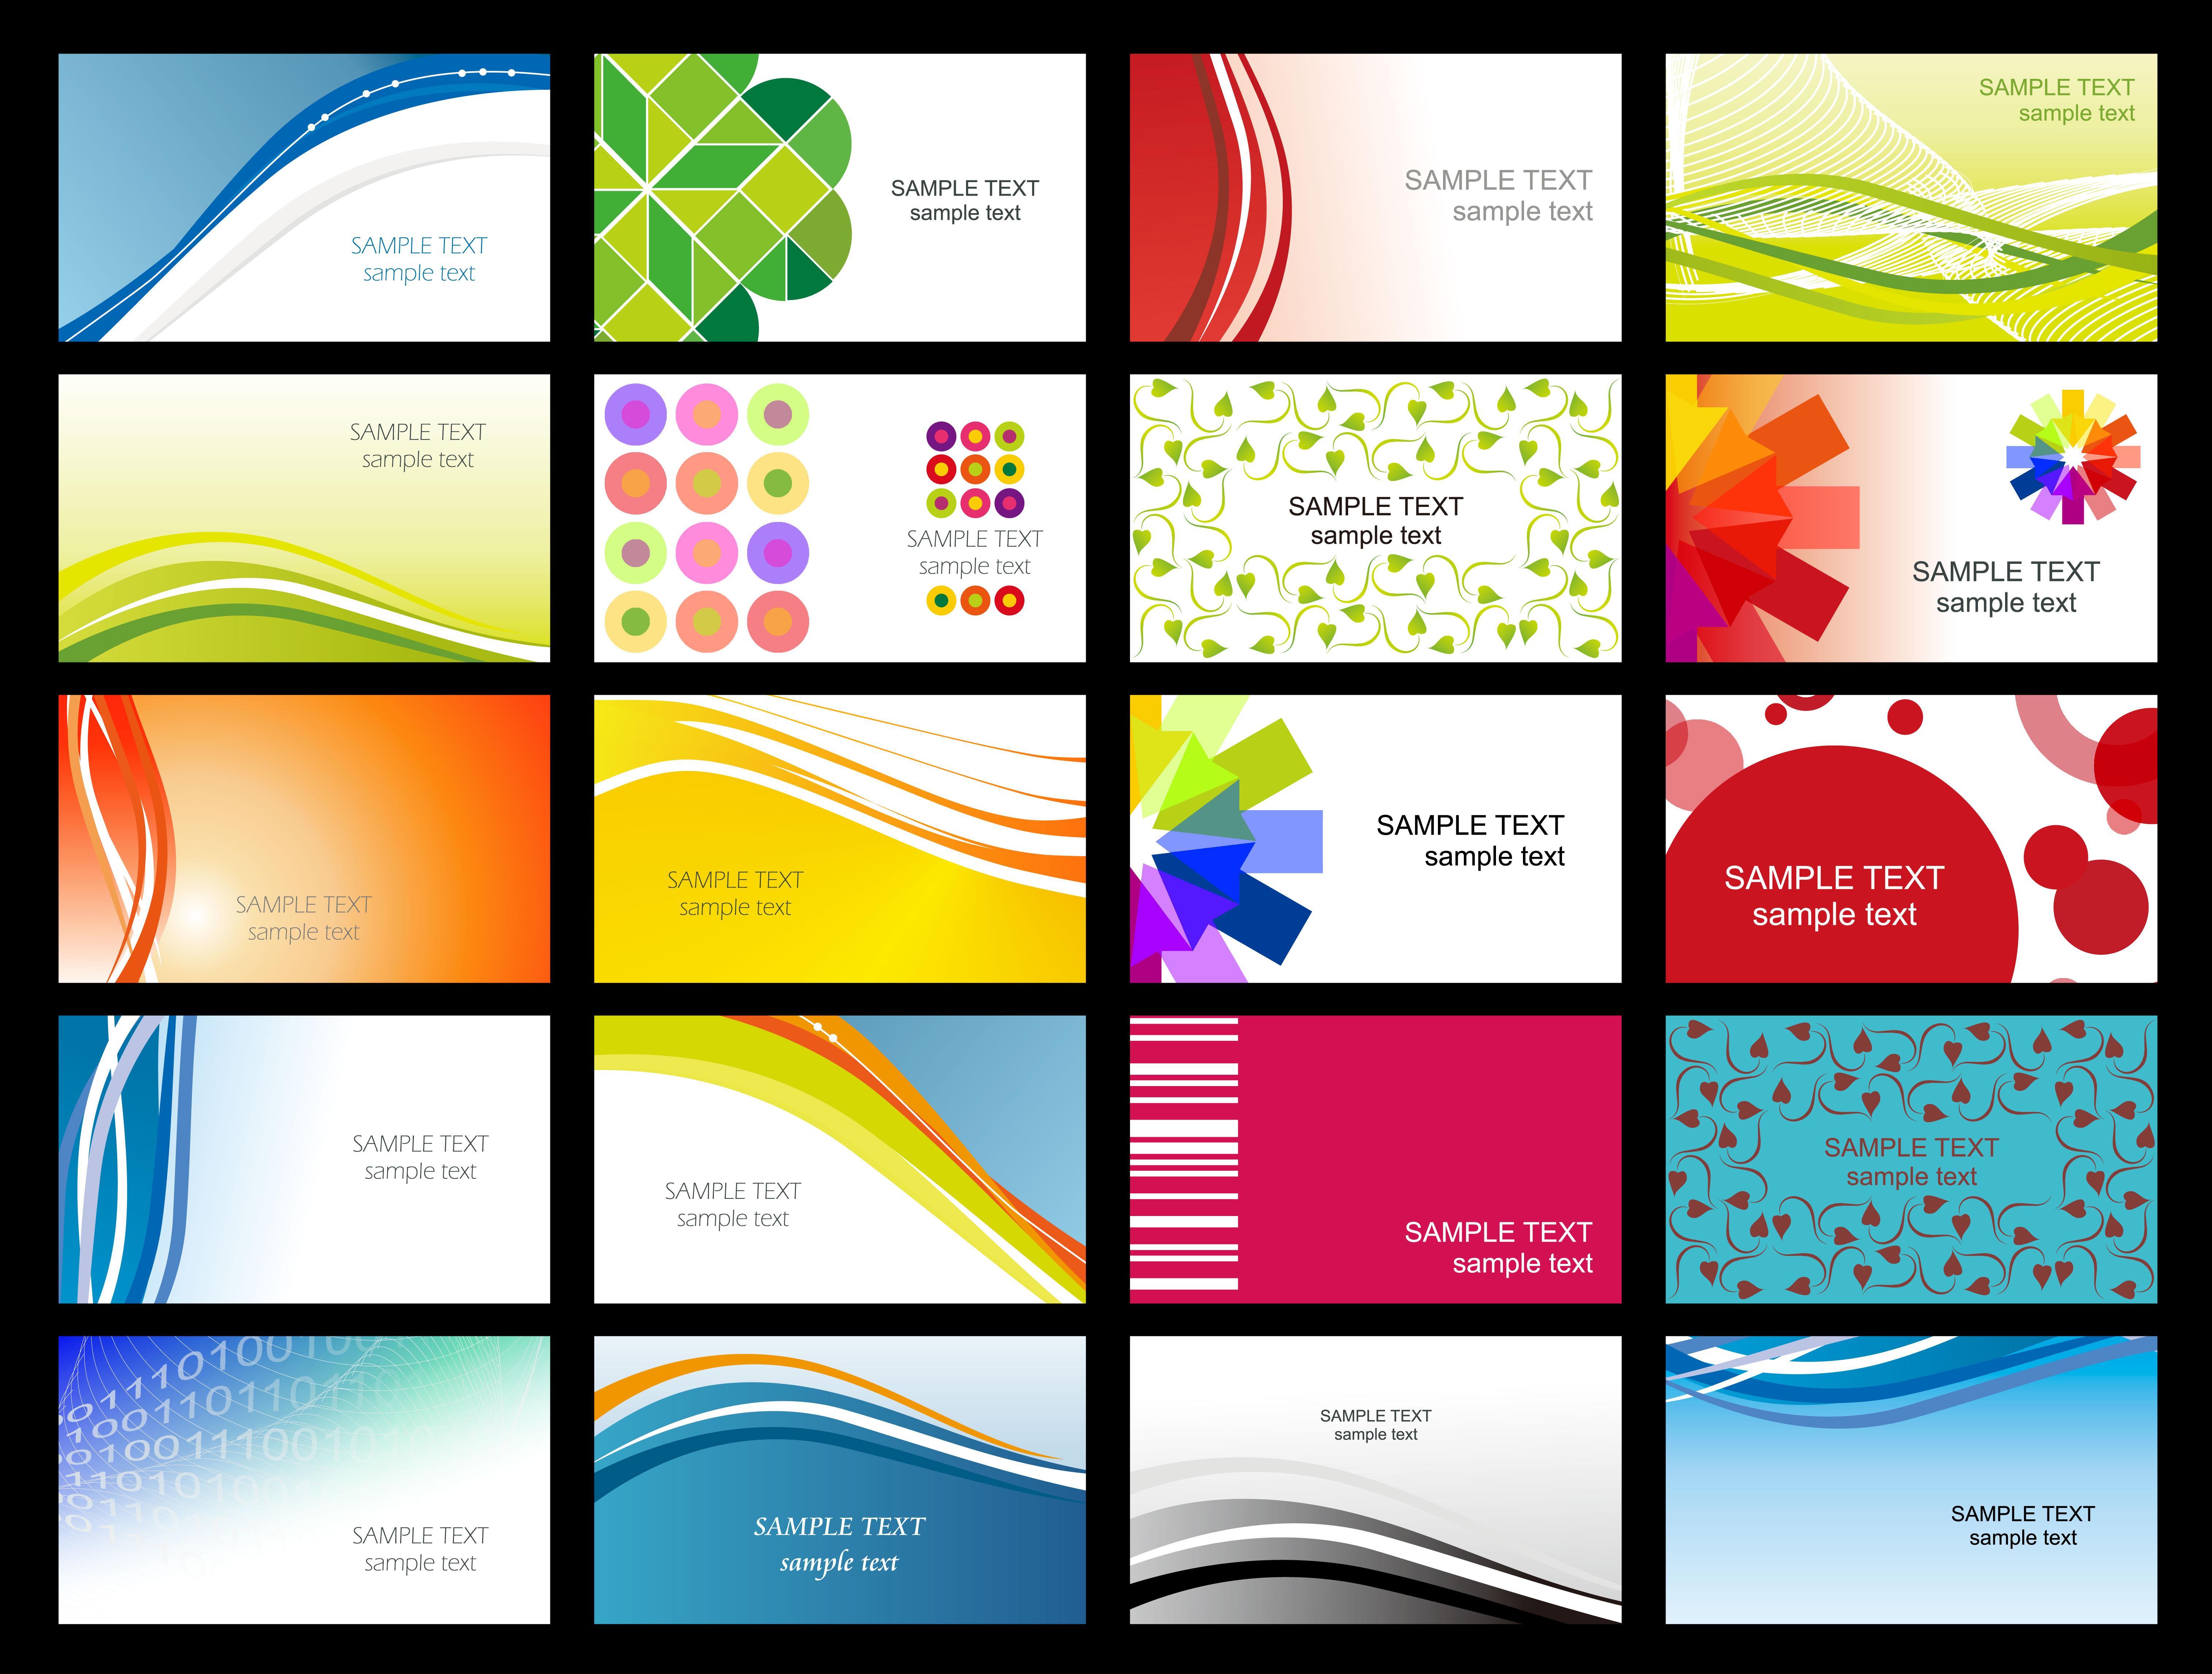 002 Freee Business Card Templates Template Ideas Sample Fresh Of - Free Printable Business Card Templates Pdf